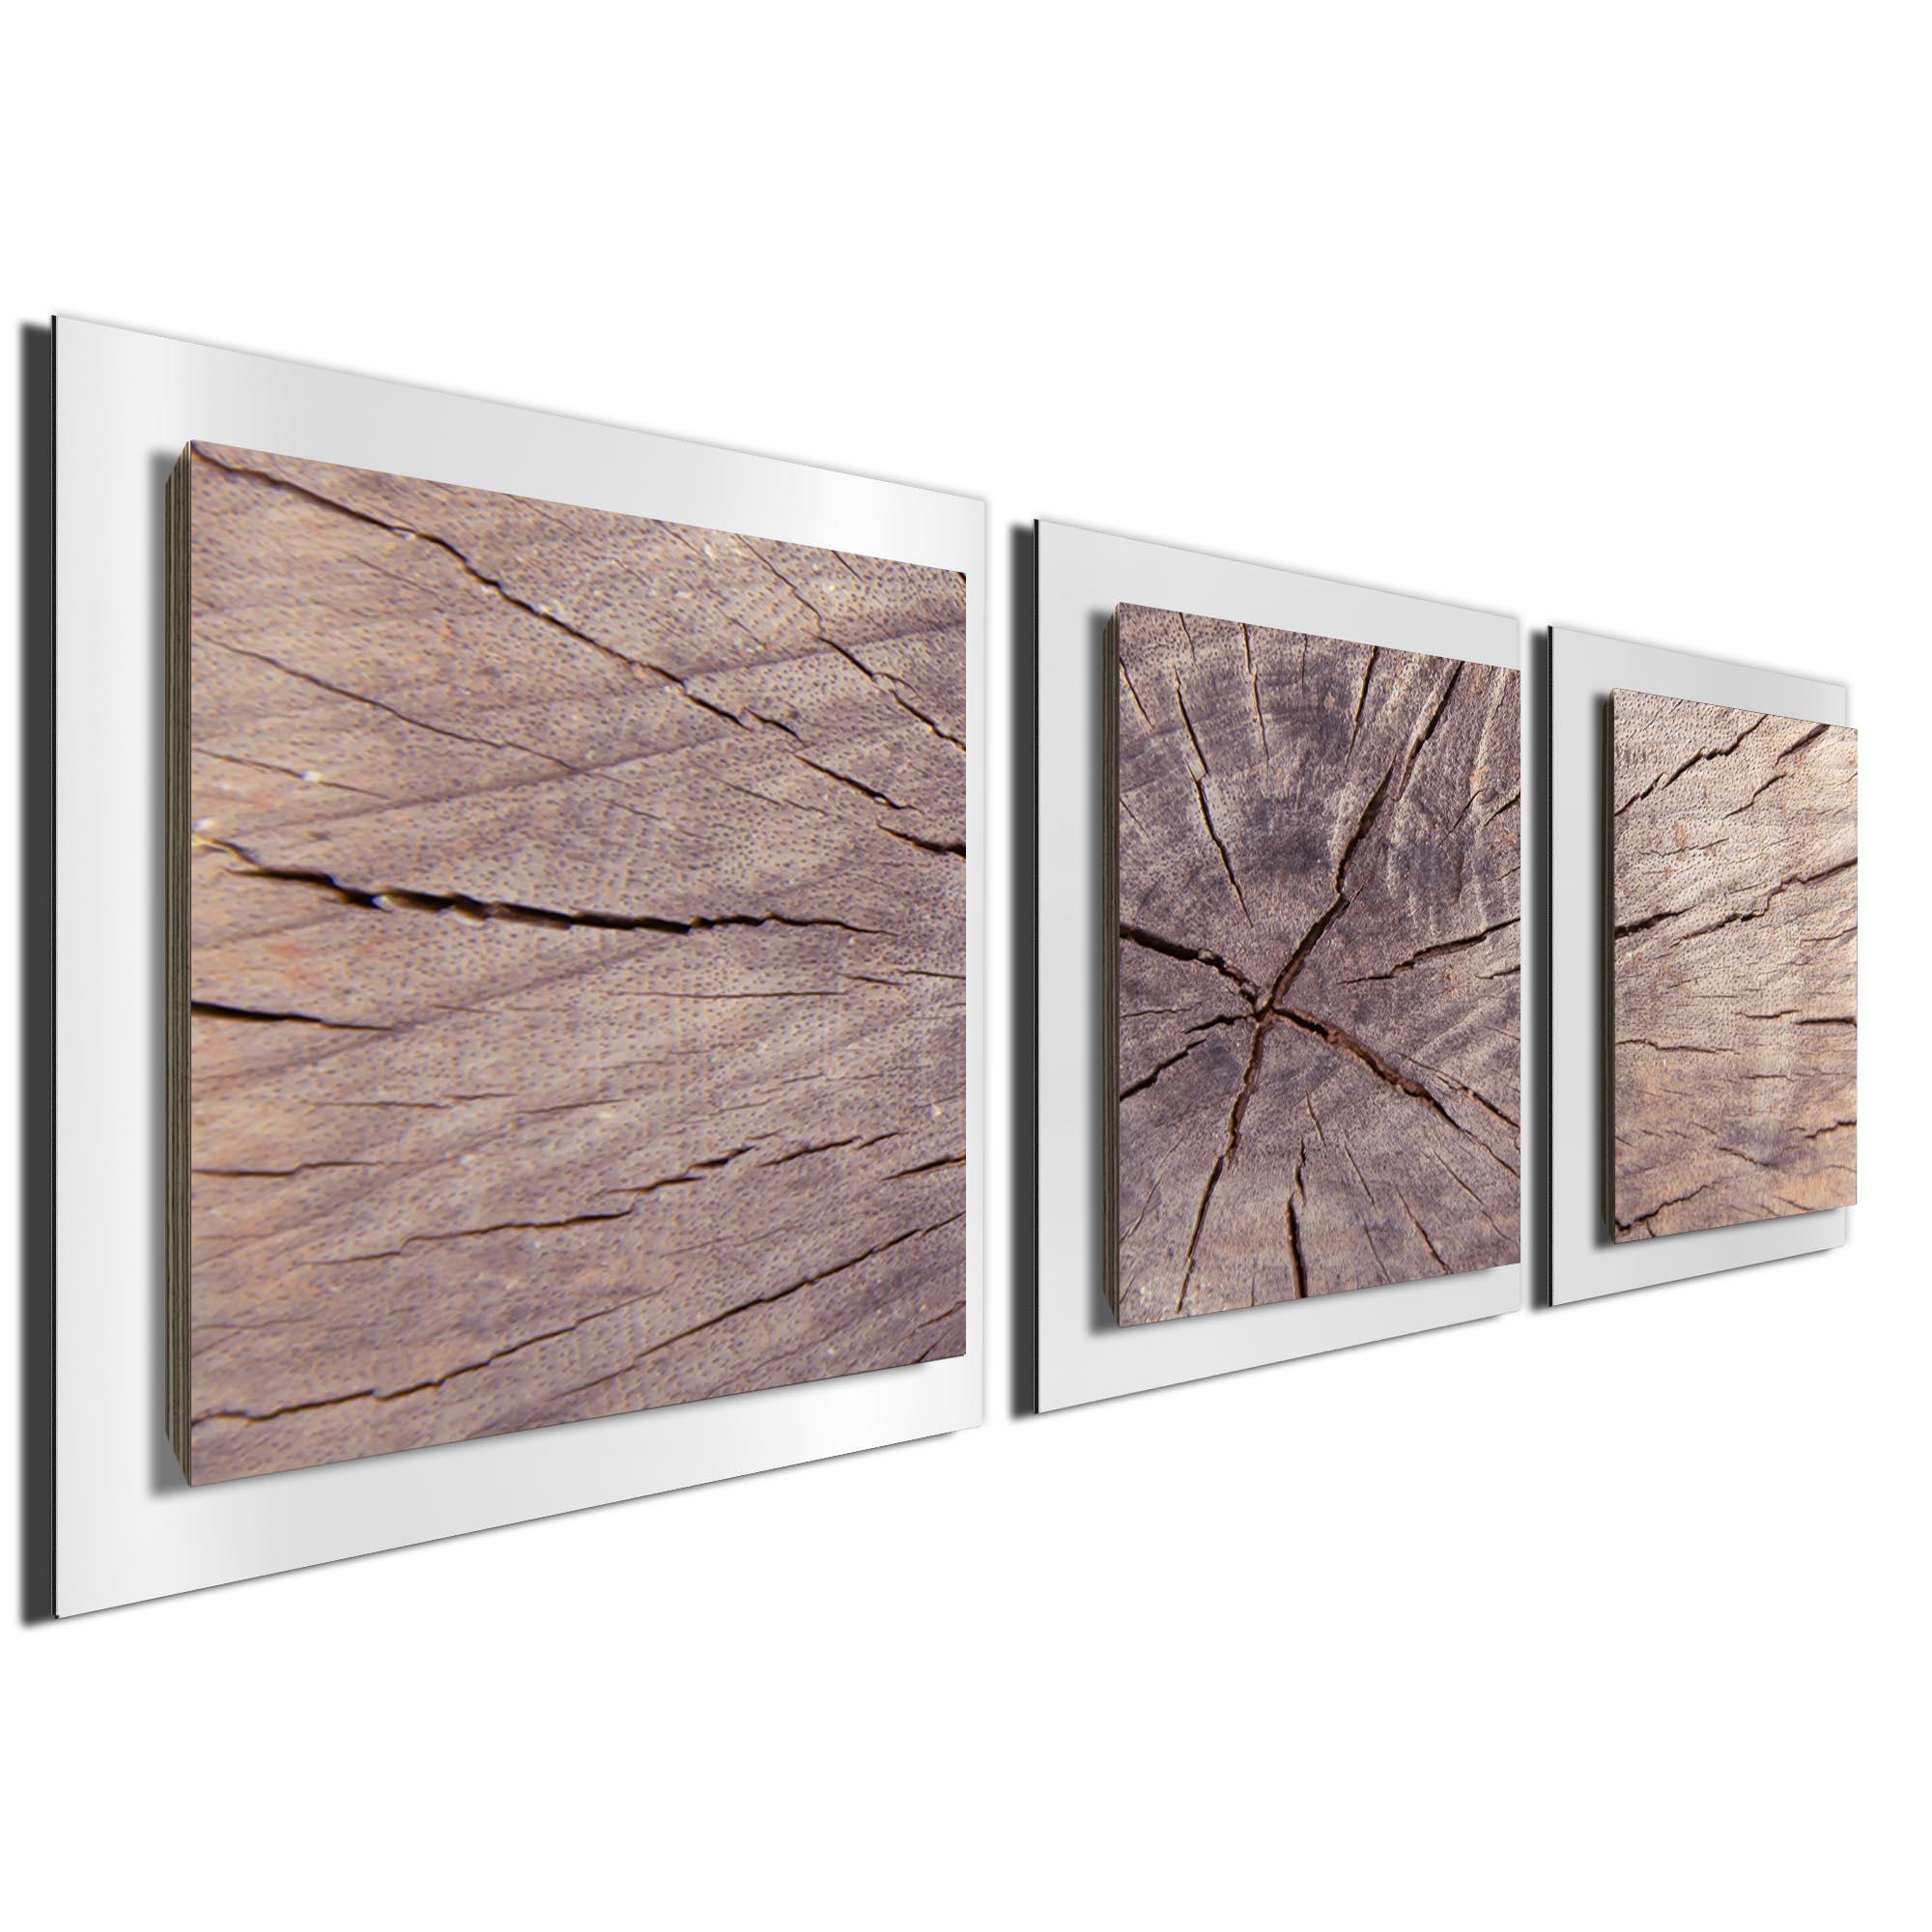 Cracked Wood Essence White by Adam Schwoeppe Rustic Modern Style Wood Wall Art - Image 2